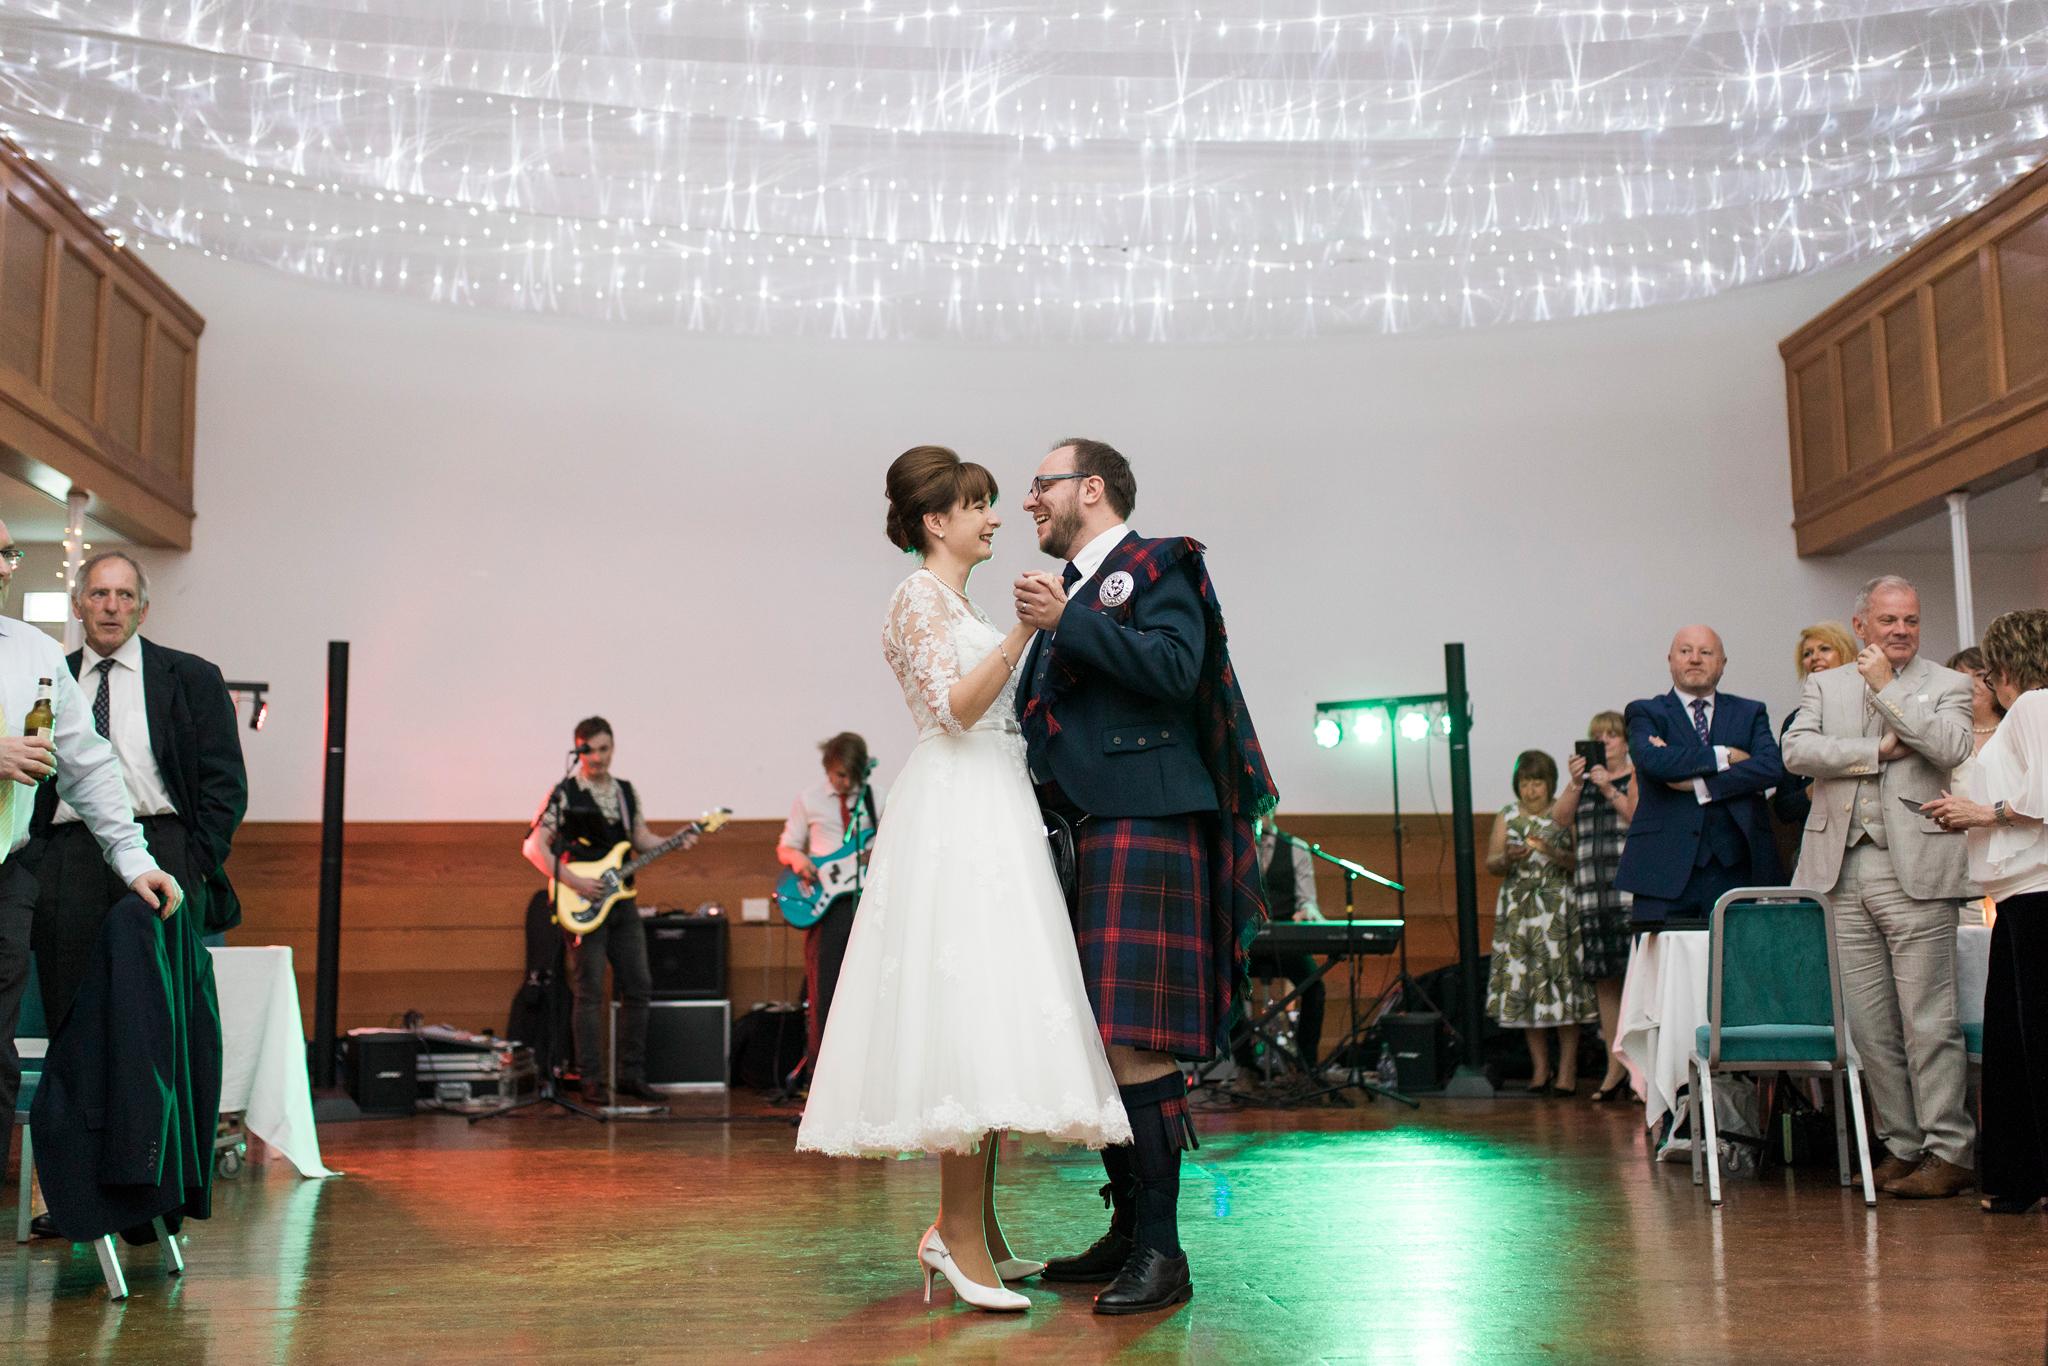 110-desination-wedding-photographer-scotland.jpg